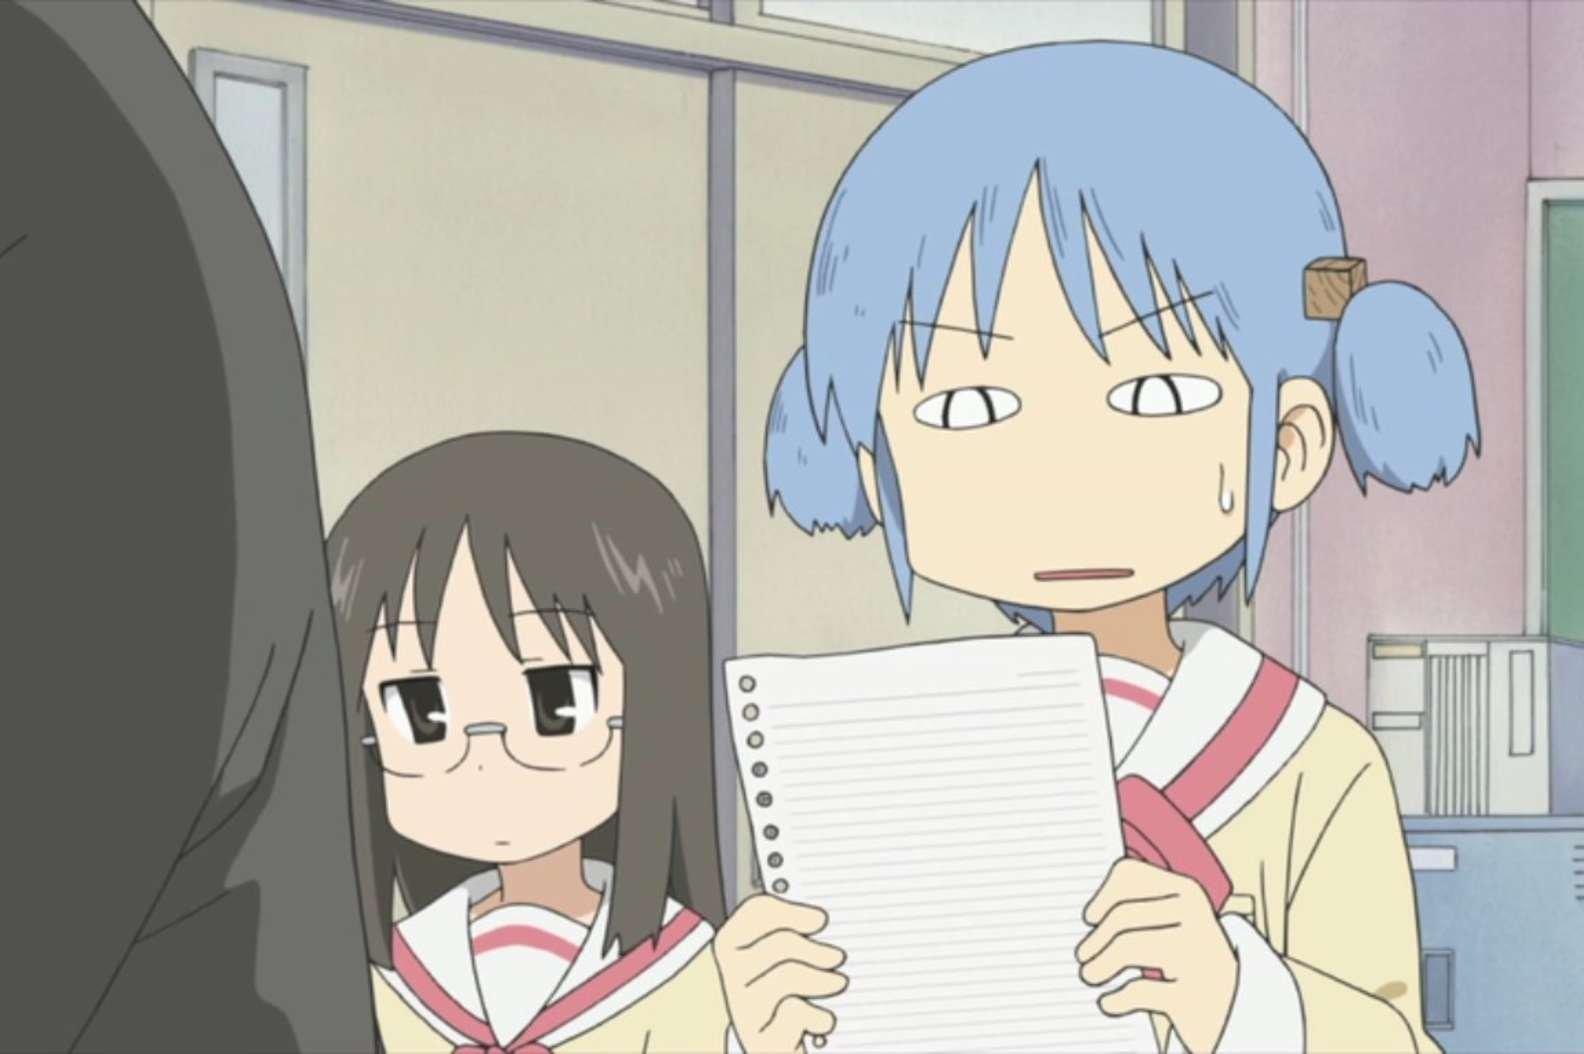 nichijou anime kyoto animation